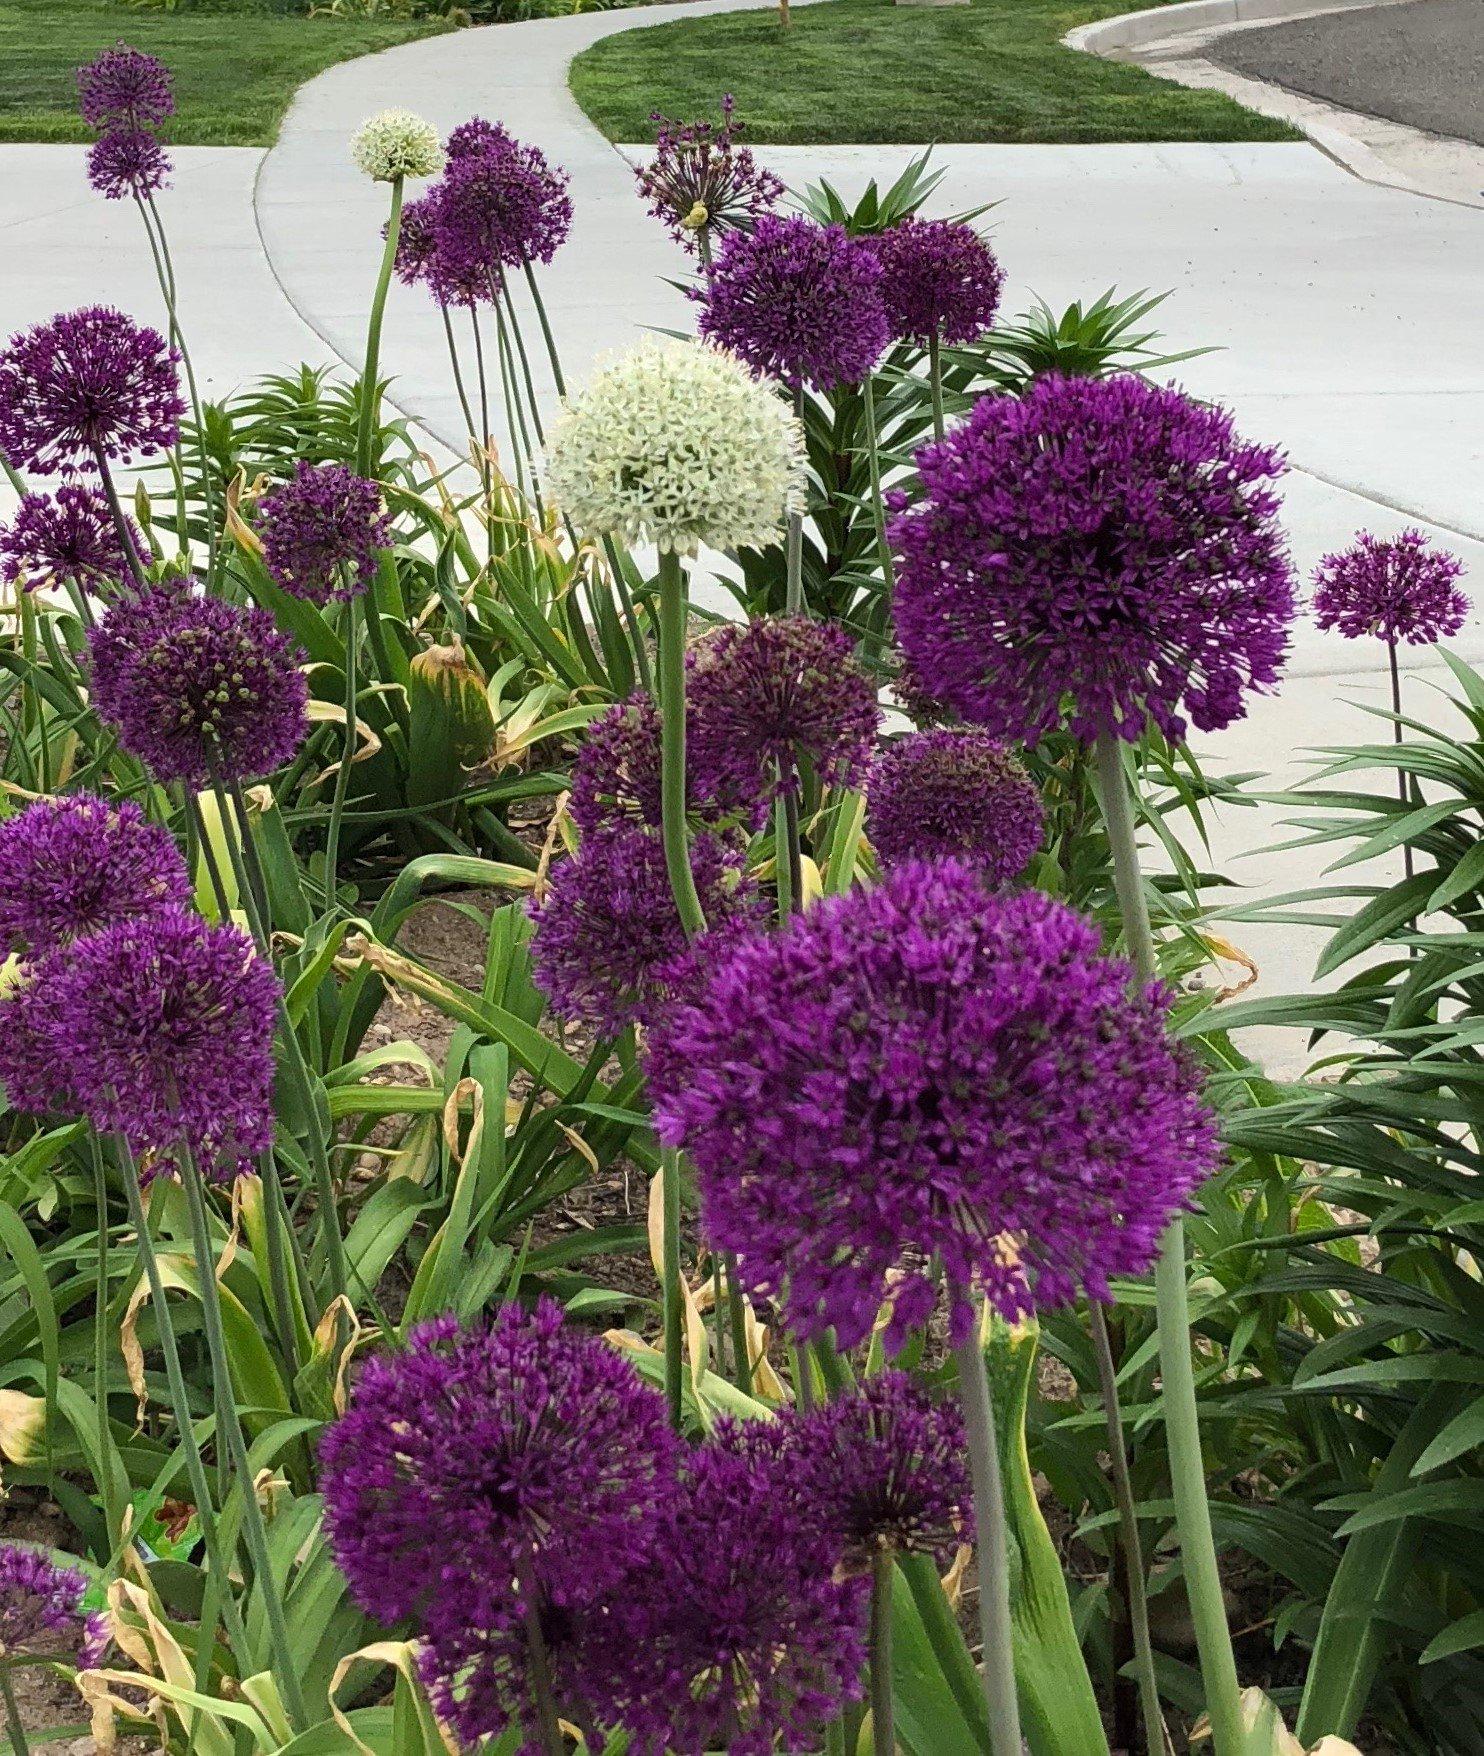 Allium Purple Blend 30 Bulbs--4-6 Inch Flower Diameter! by Daylily Nursery